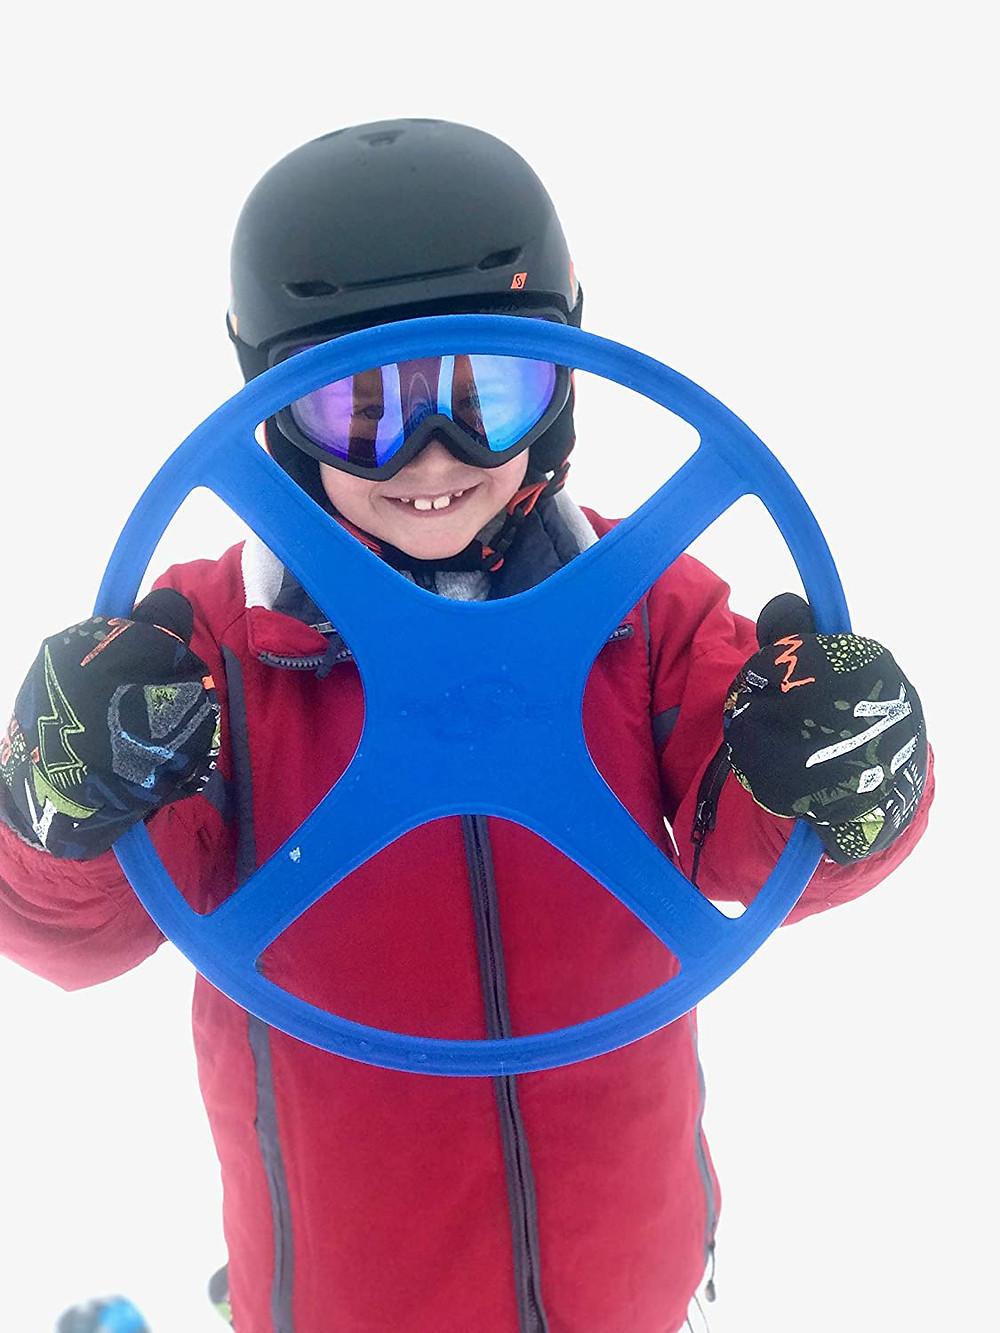 Ski child holding a Ski Ring